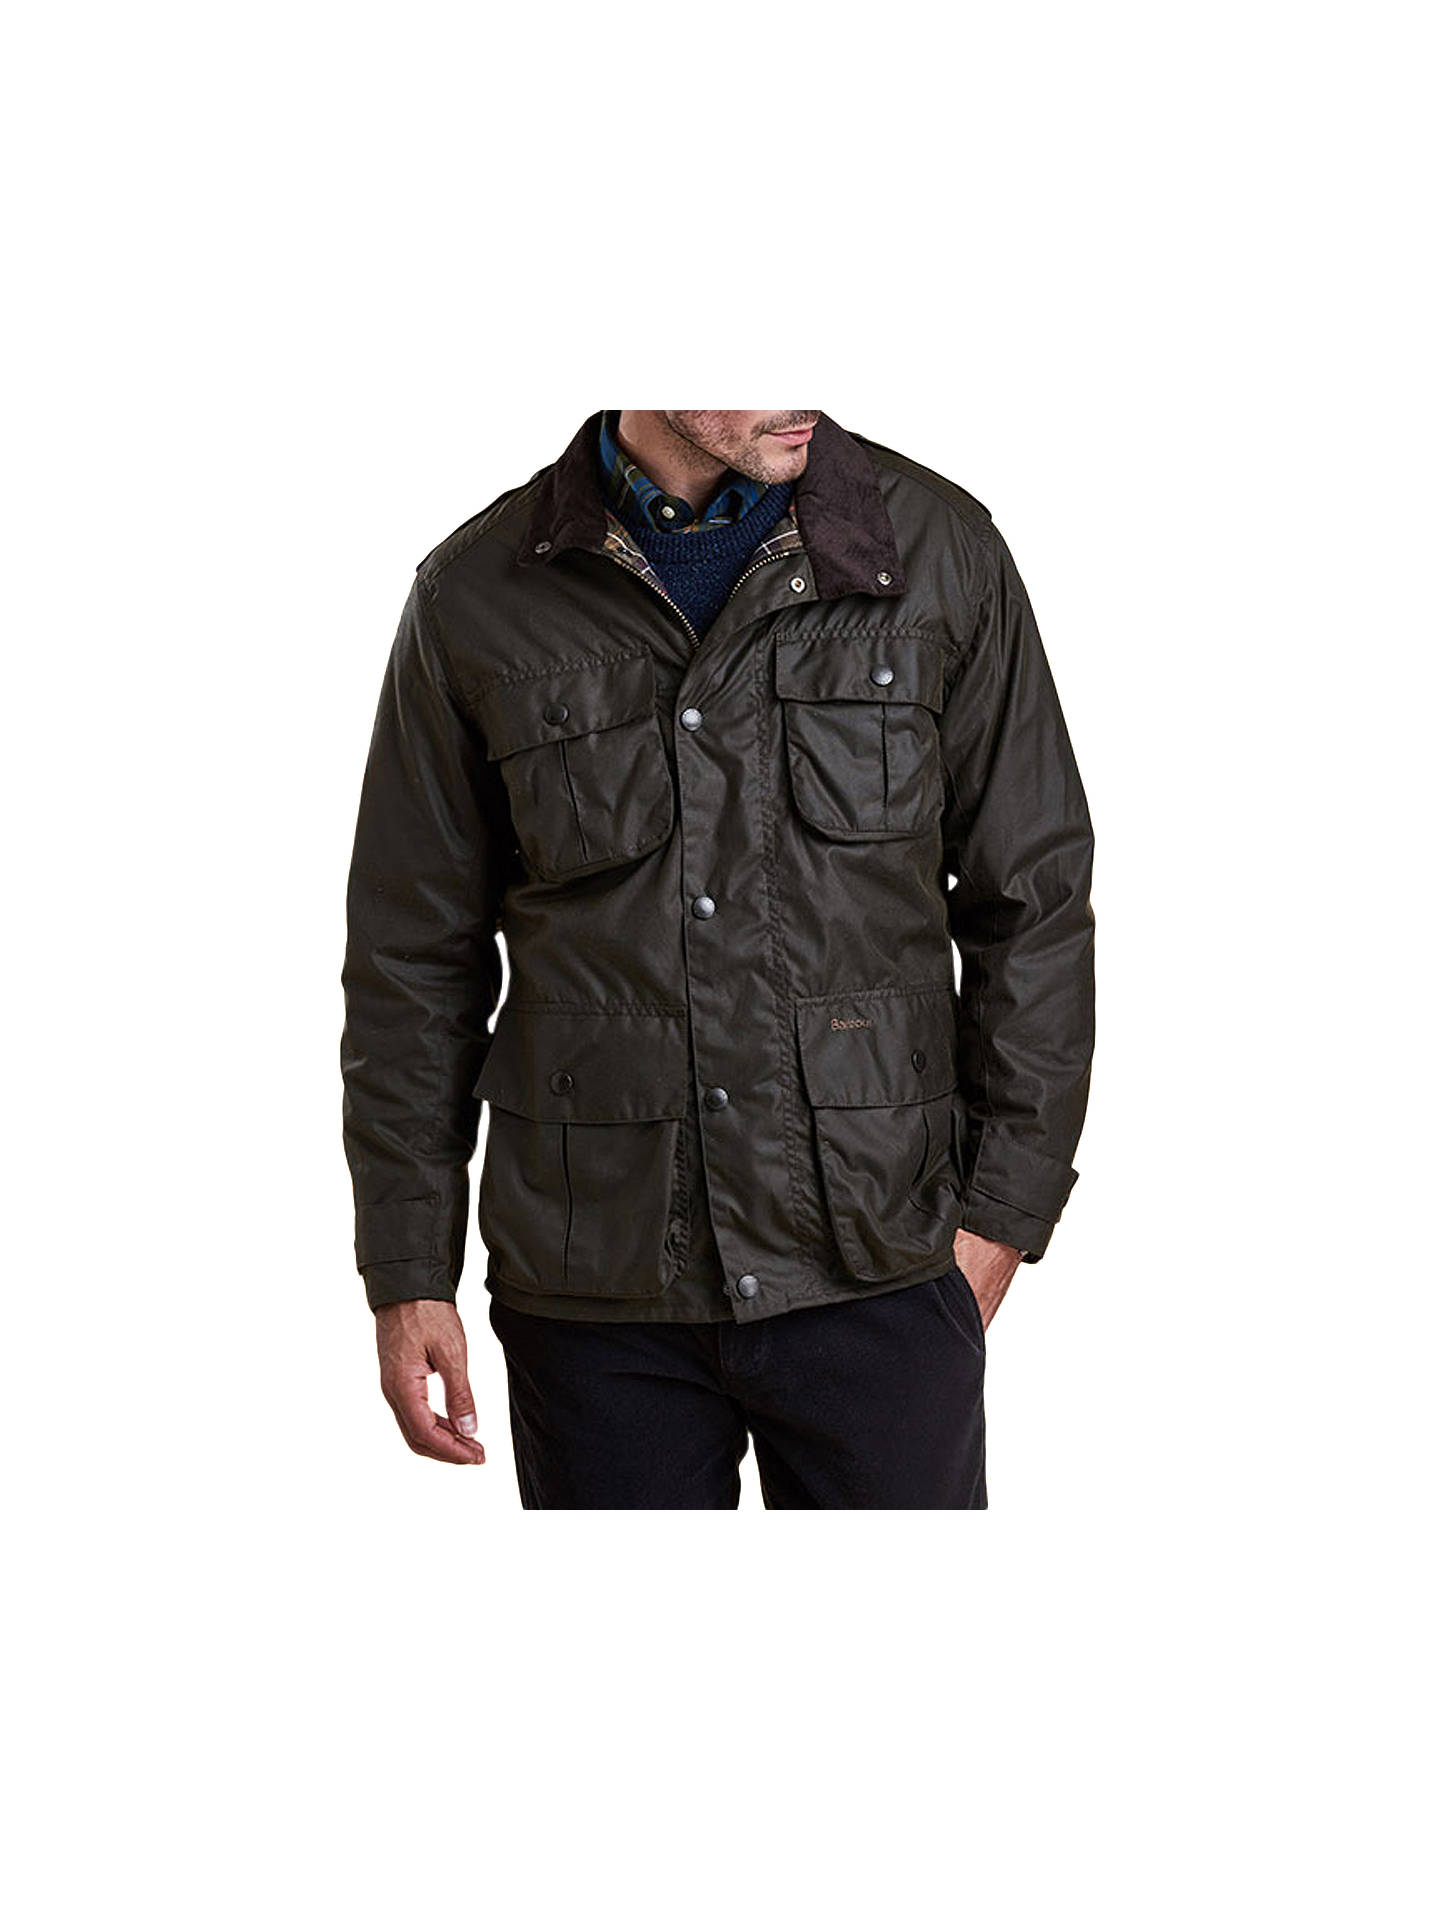 df4ca6c9a45e7 Buy Barbour Trooper Wax Jacket, Olive, S Online at johnlewis.com ...